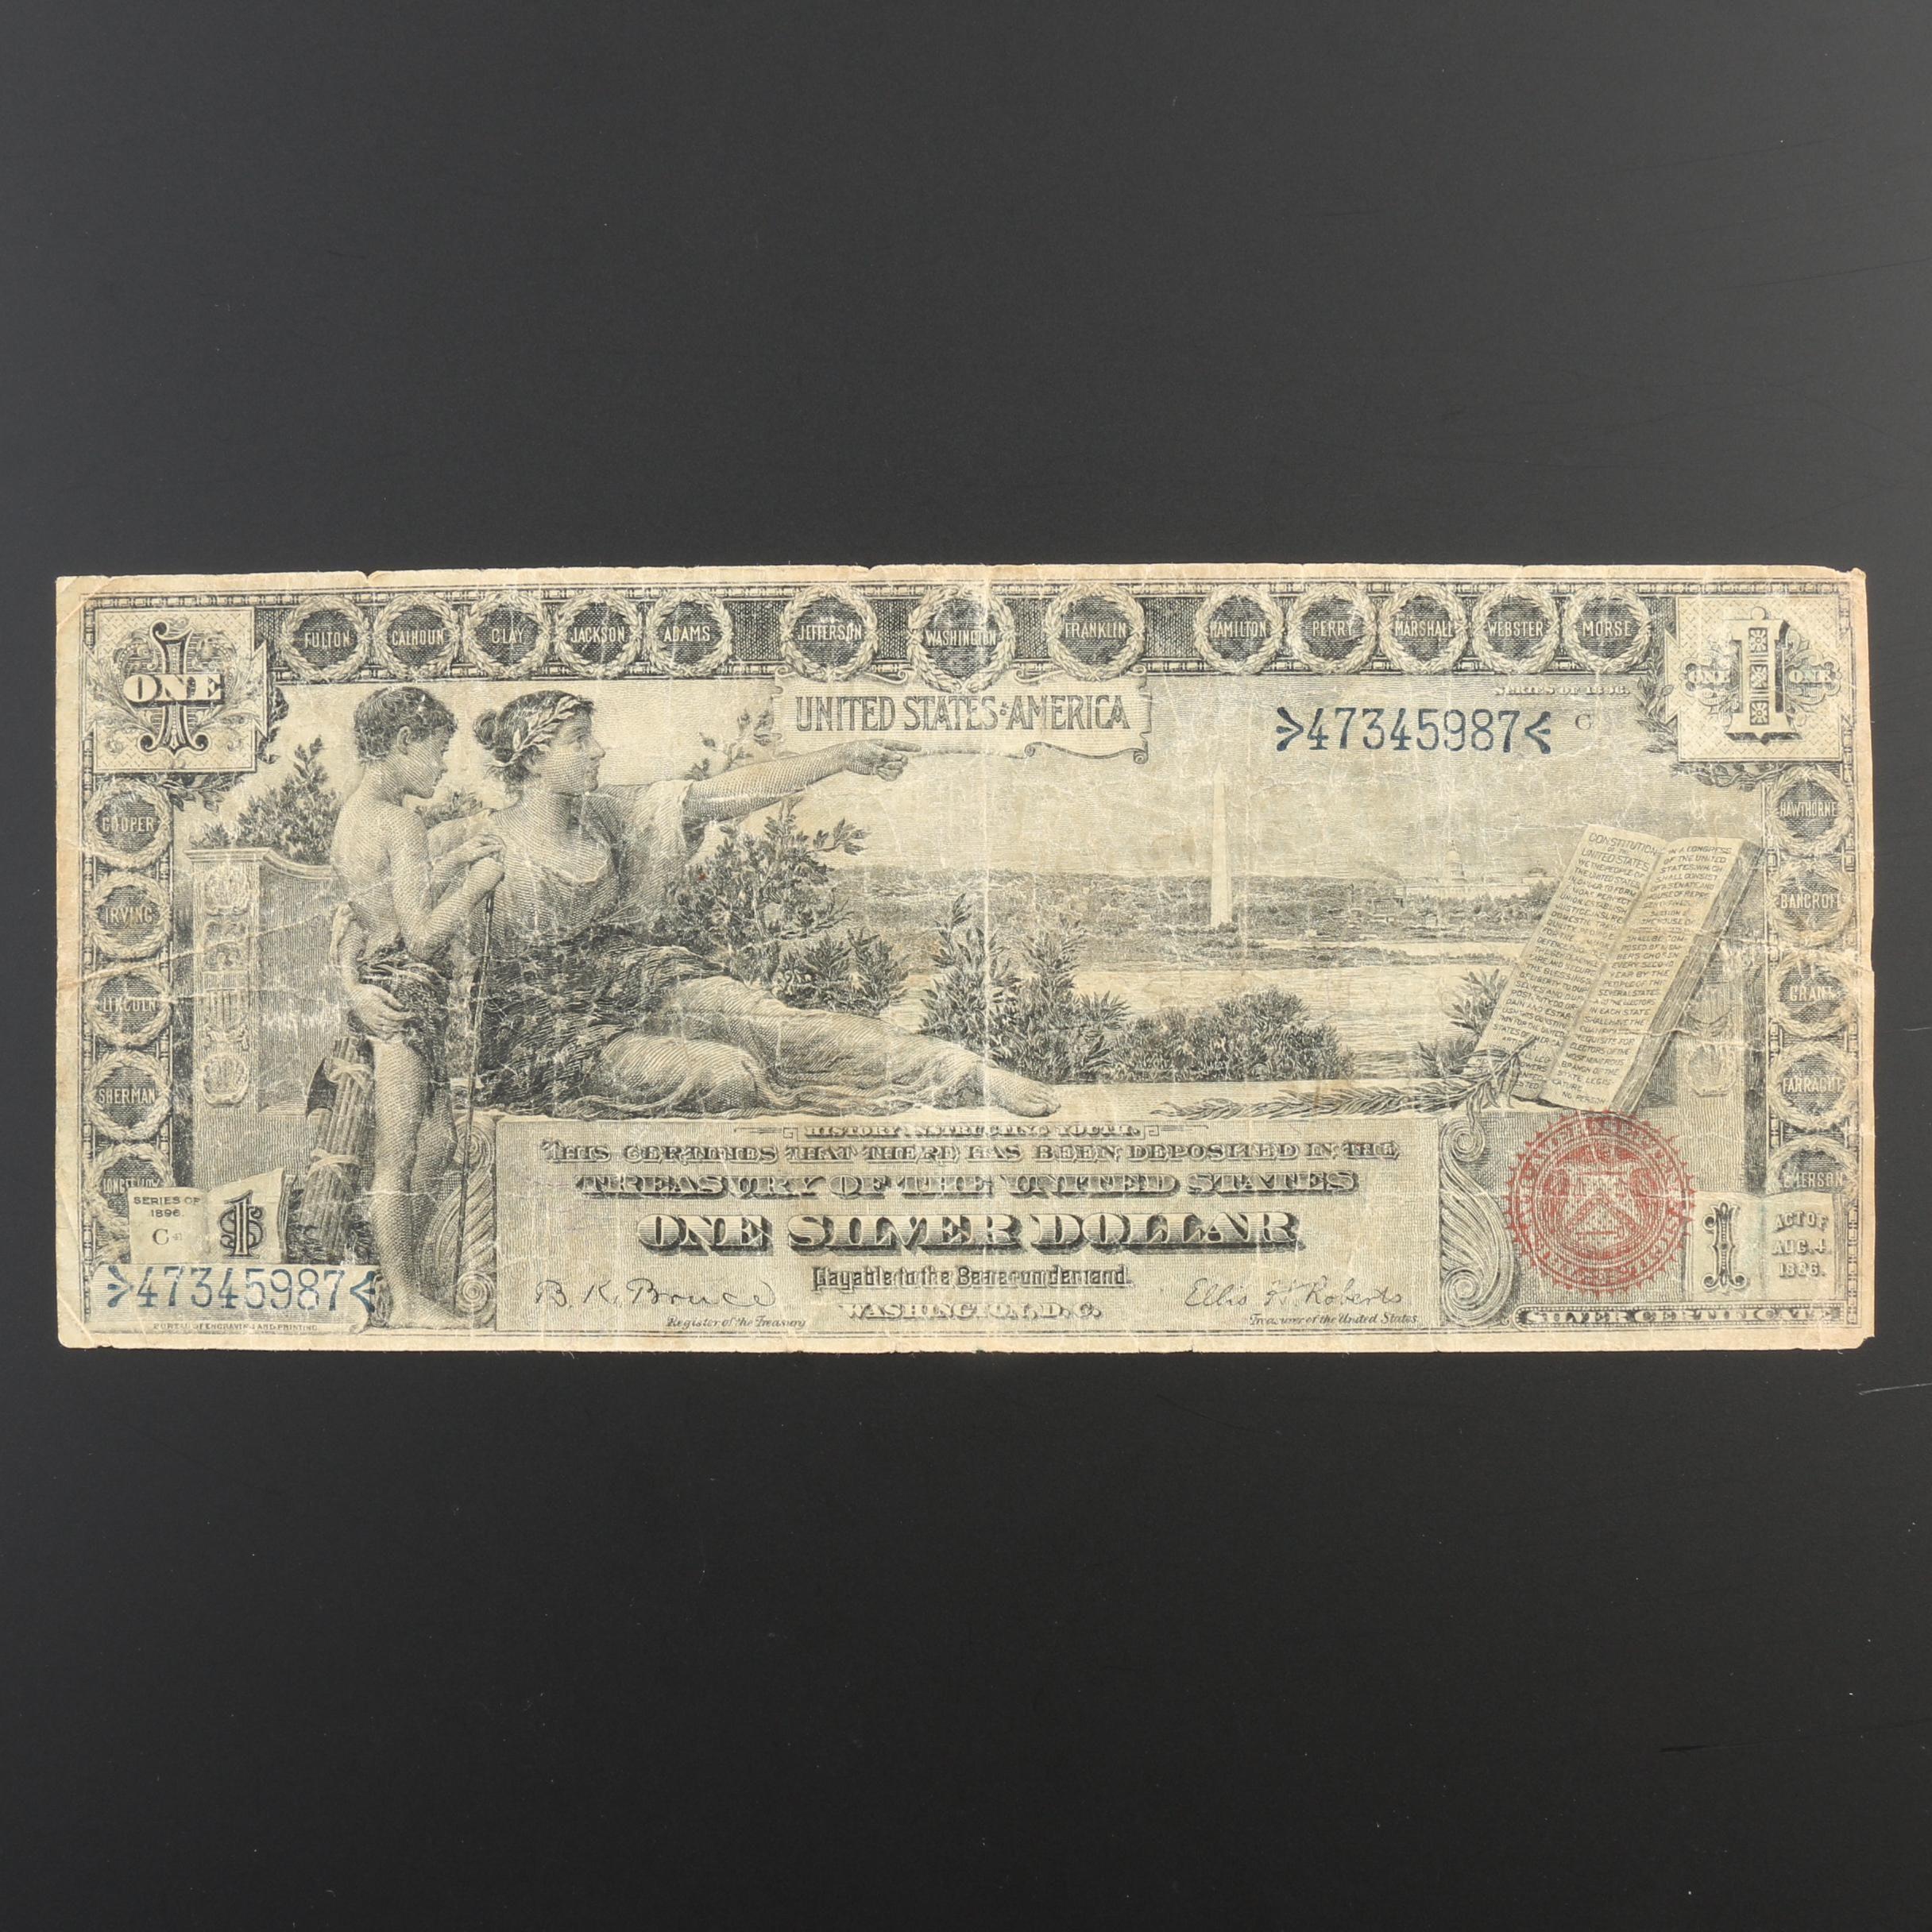 Series 1896 $1 Silver Certificate